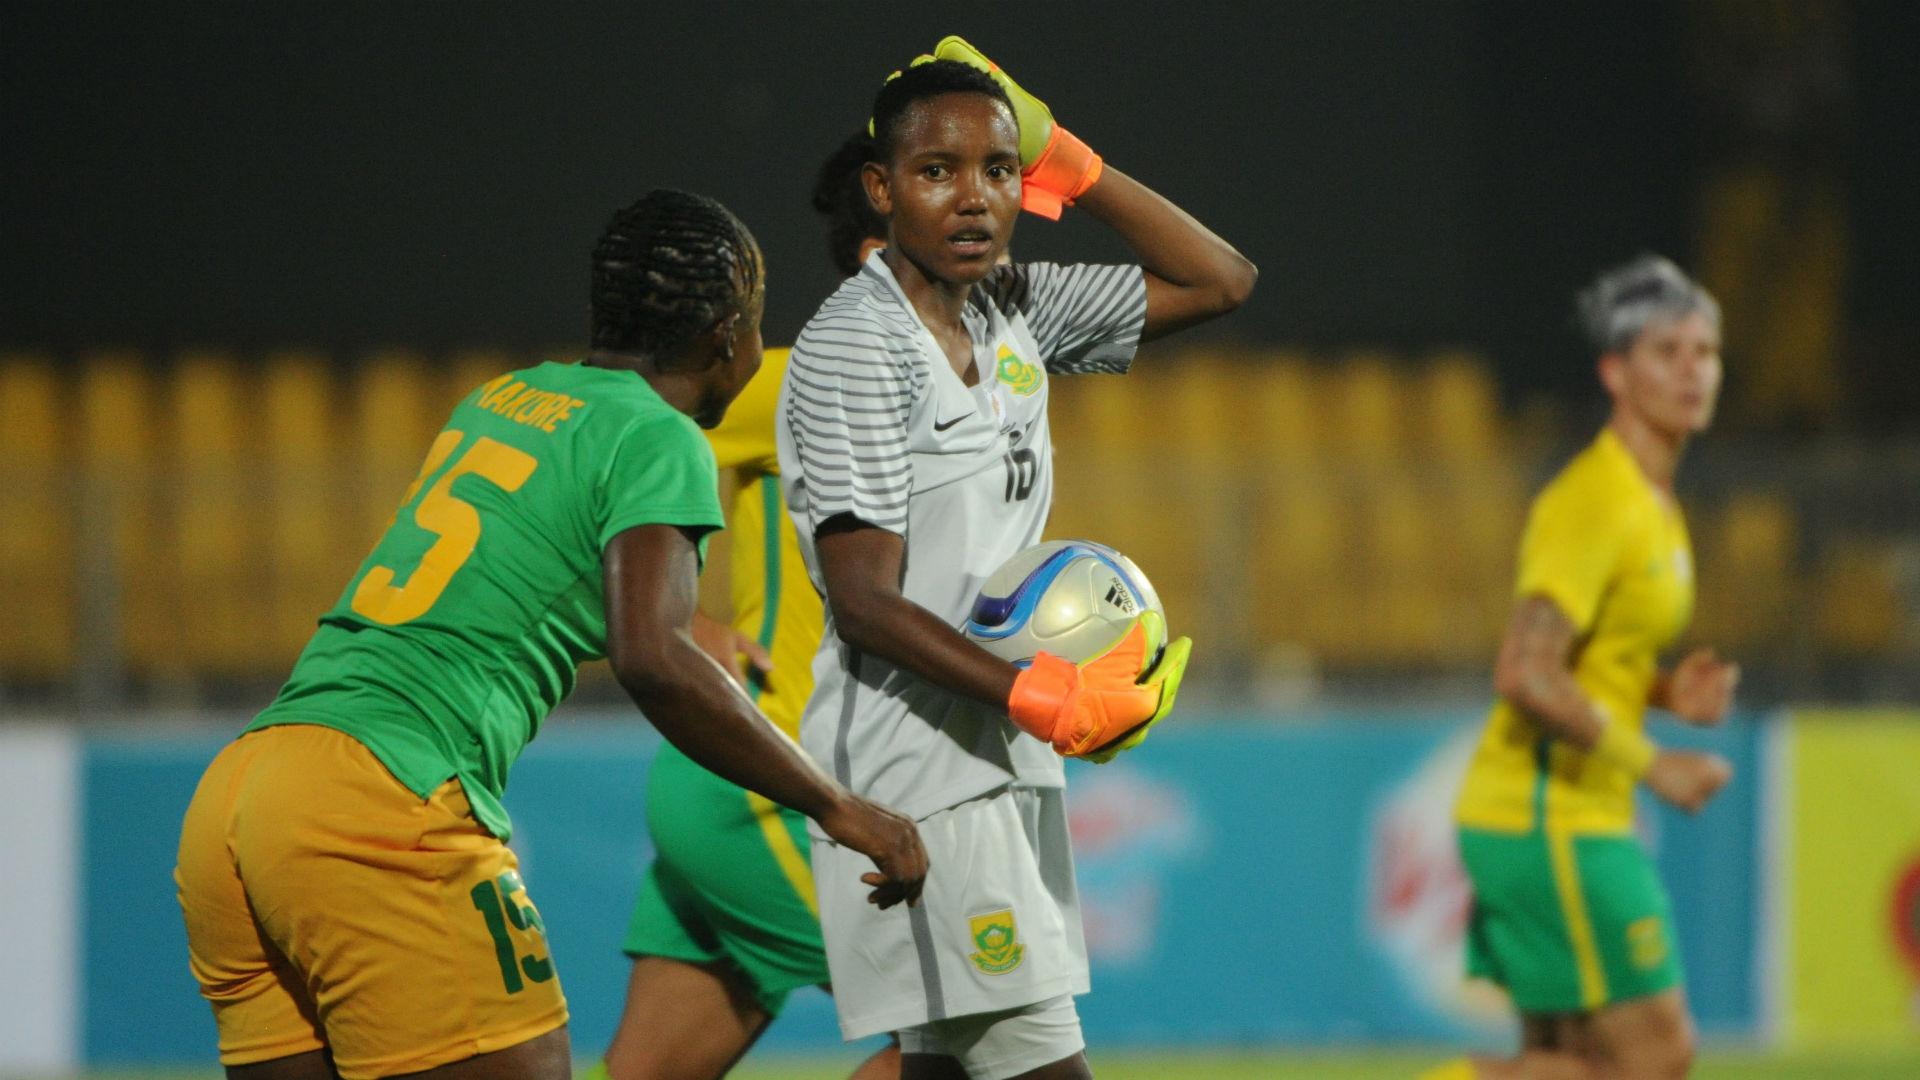 Andile Dlamini headlines Banyana Banyana's provisional squad for Cosafa Women's Cup